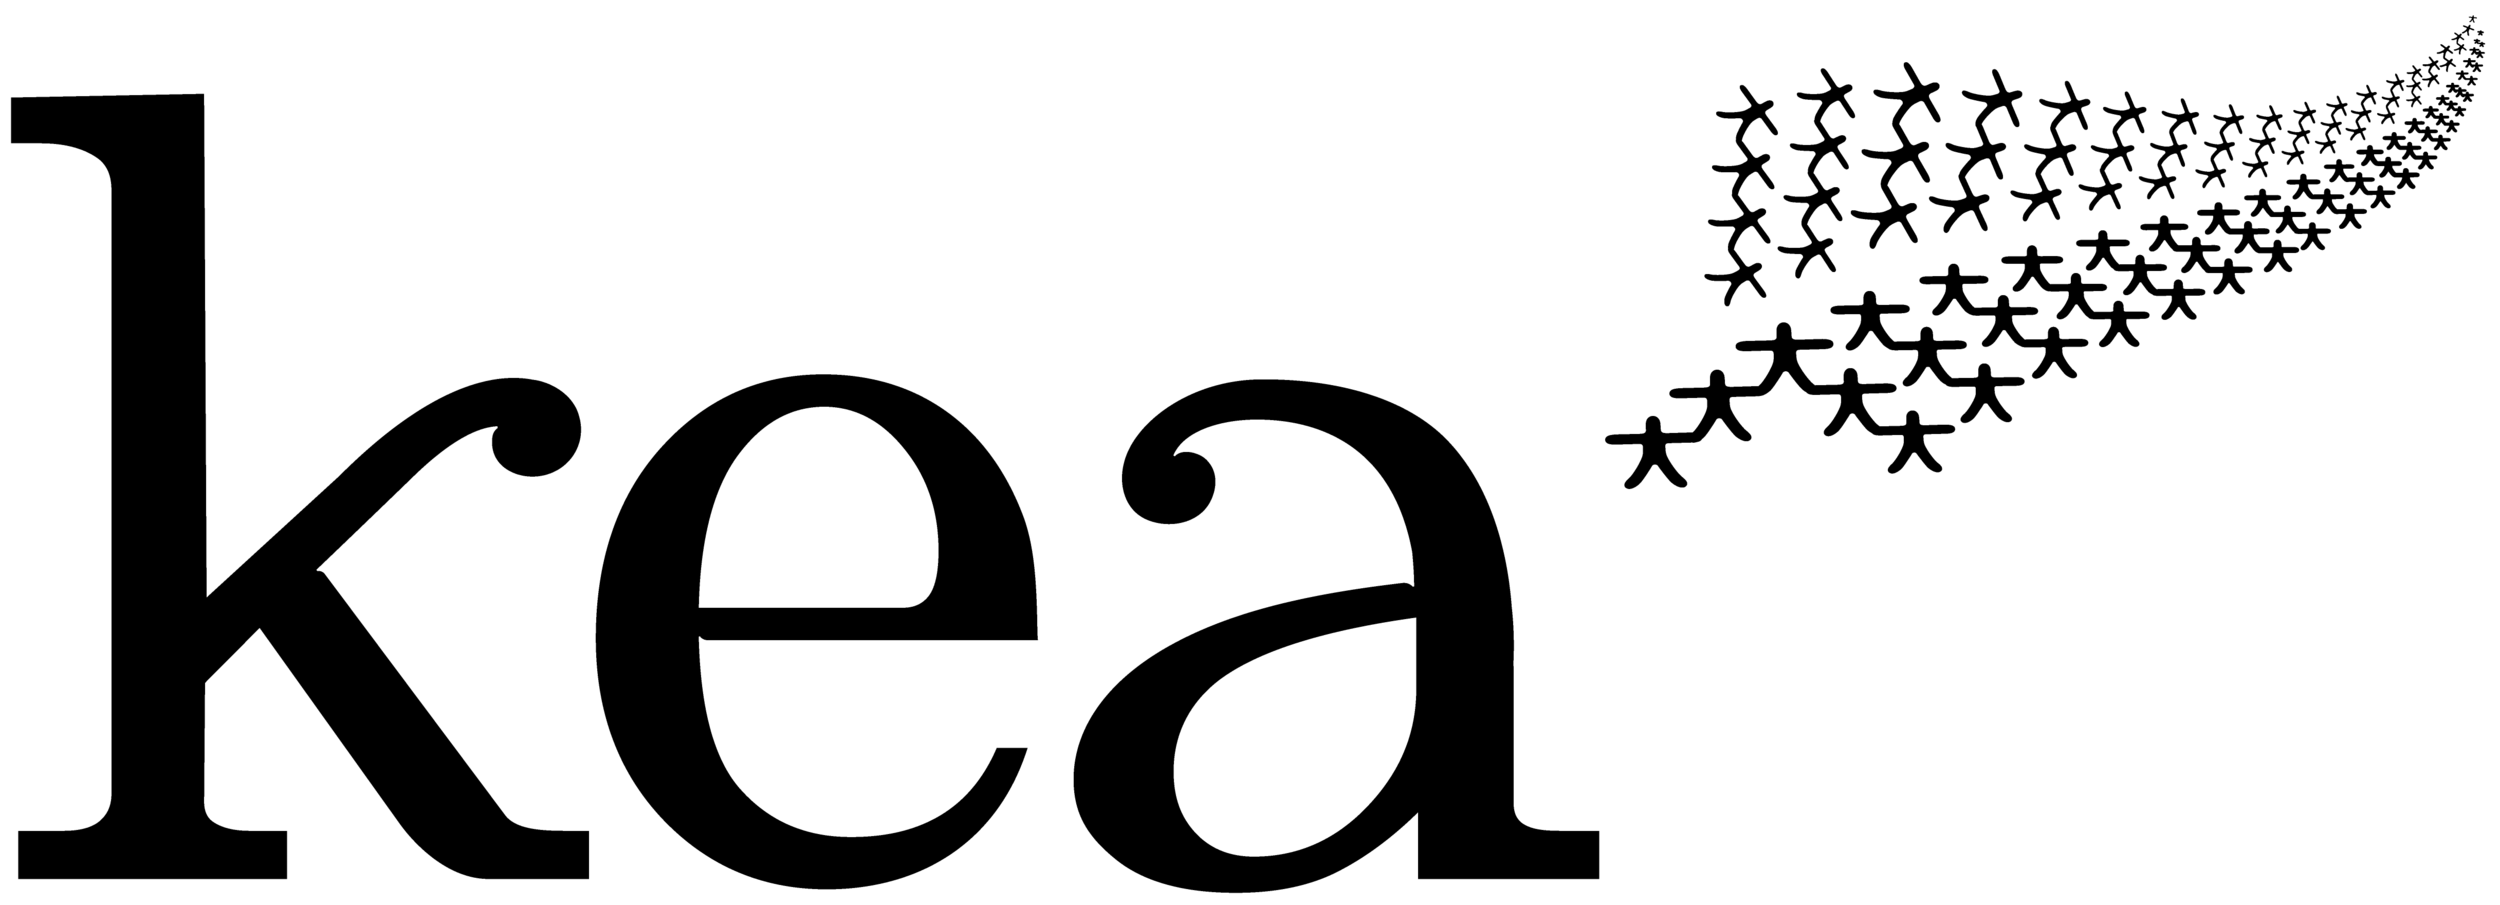 Kea Logo Wordless - Black on Clear 4864x1760 px.png